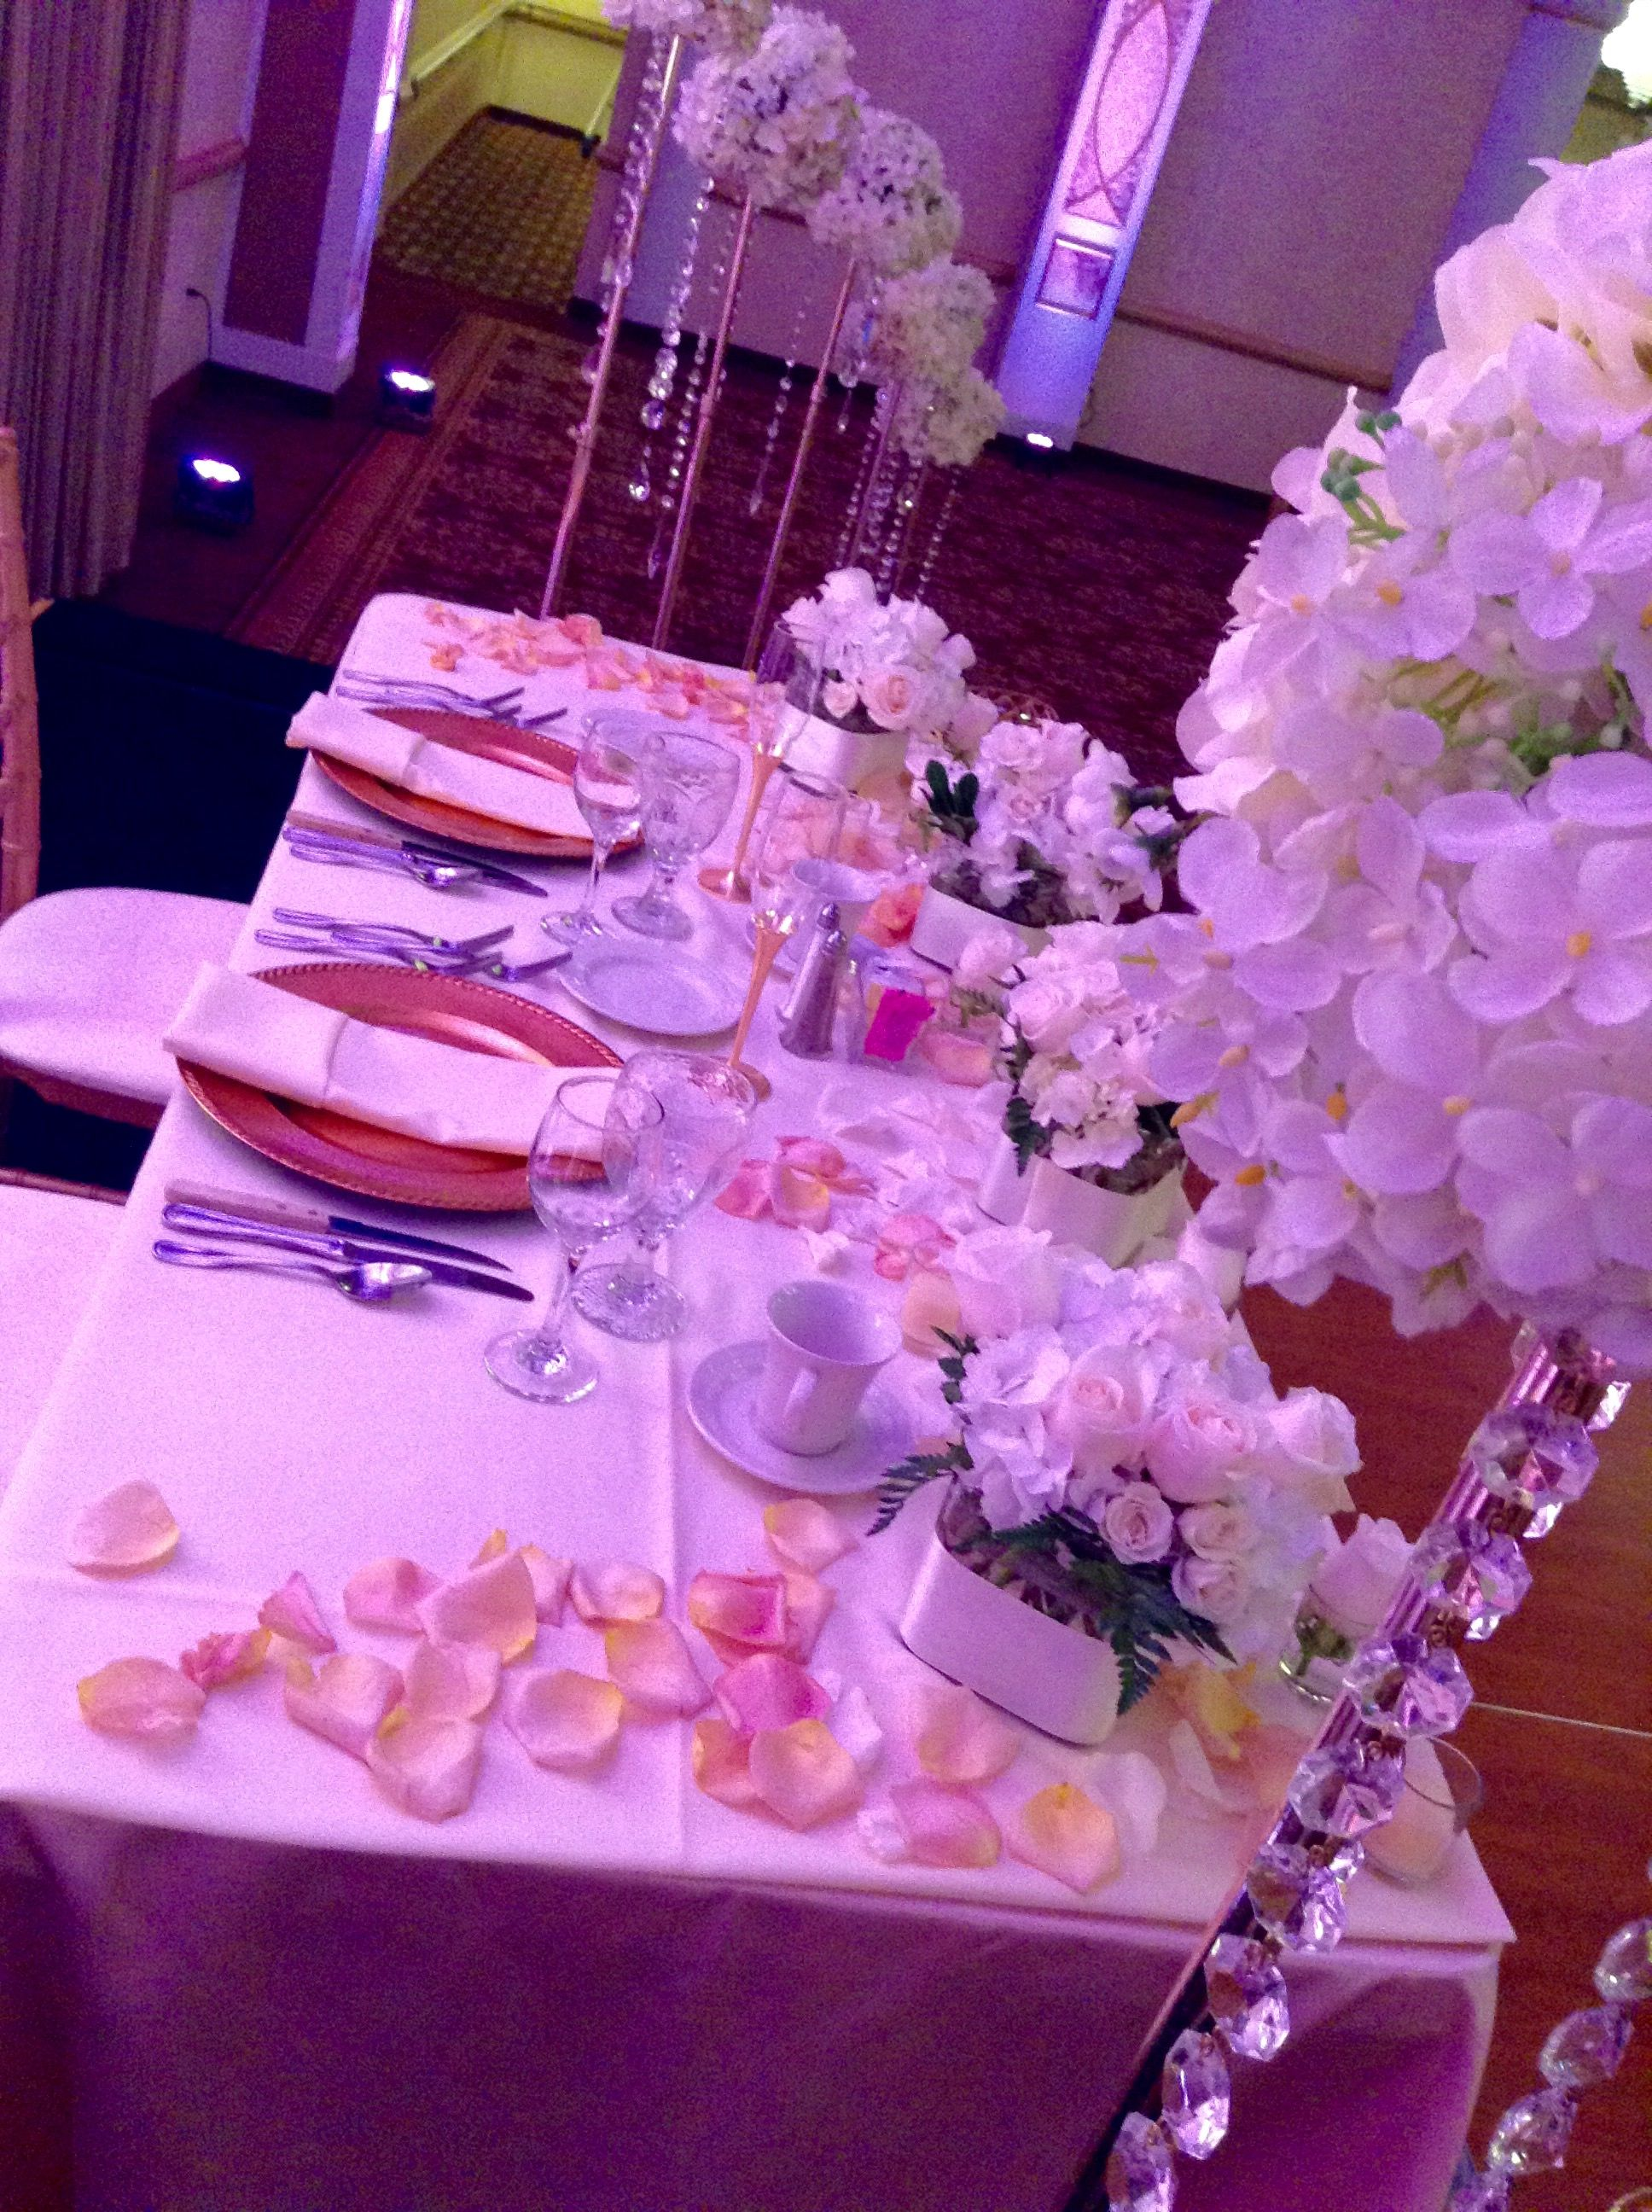 Salvatore's Weddings Bellamore Ballroom image by